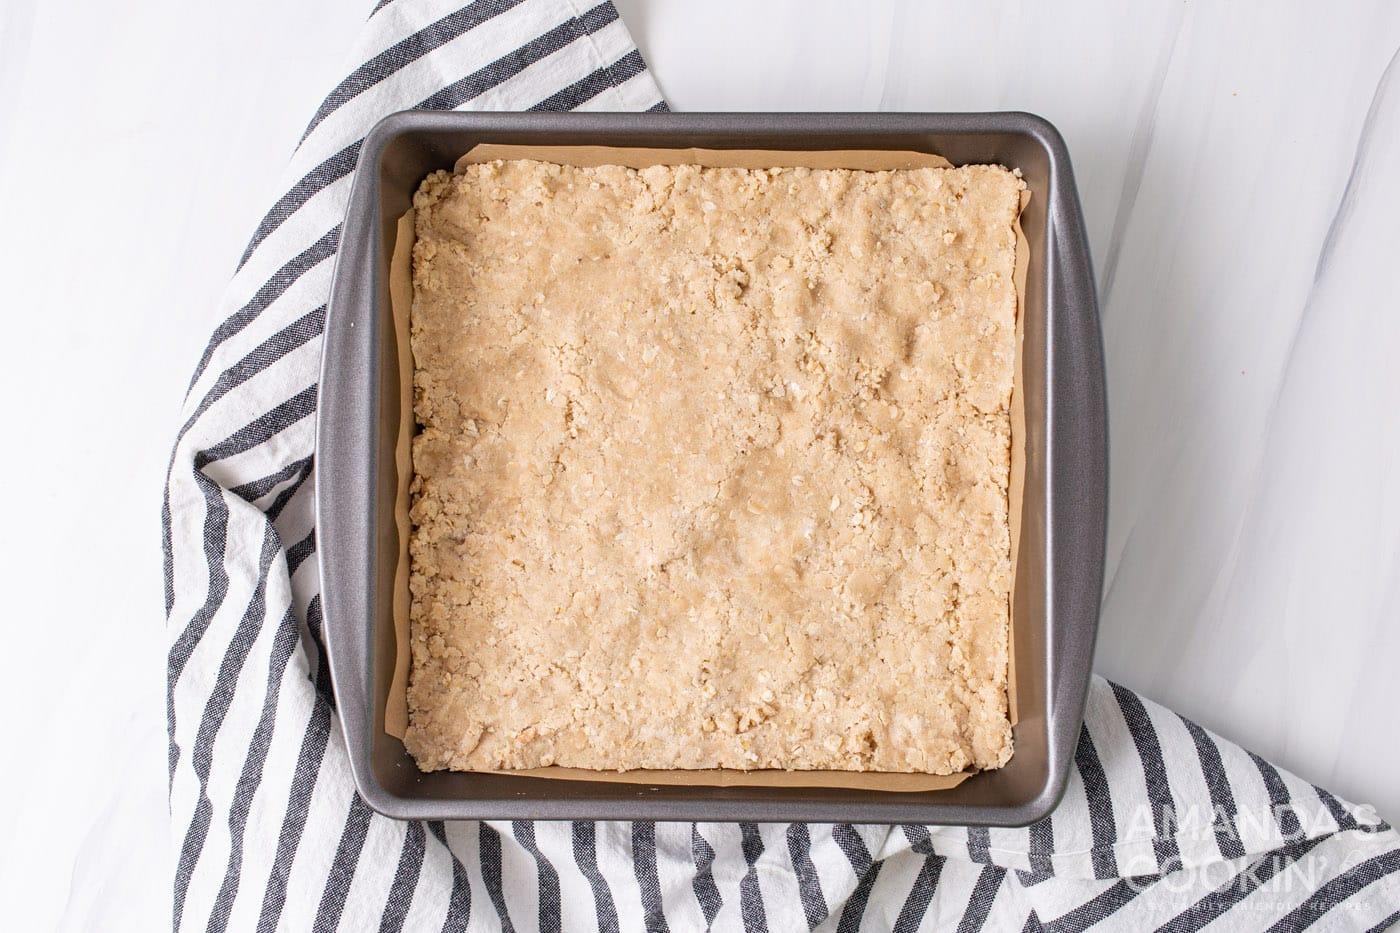 rhubarb crumble bars crust in a pan